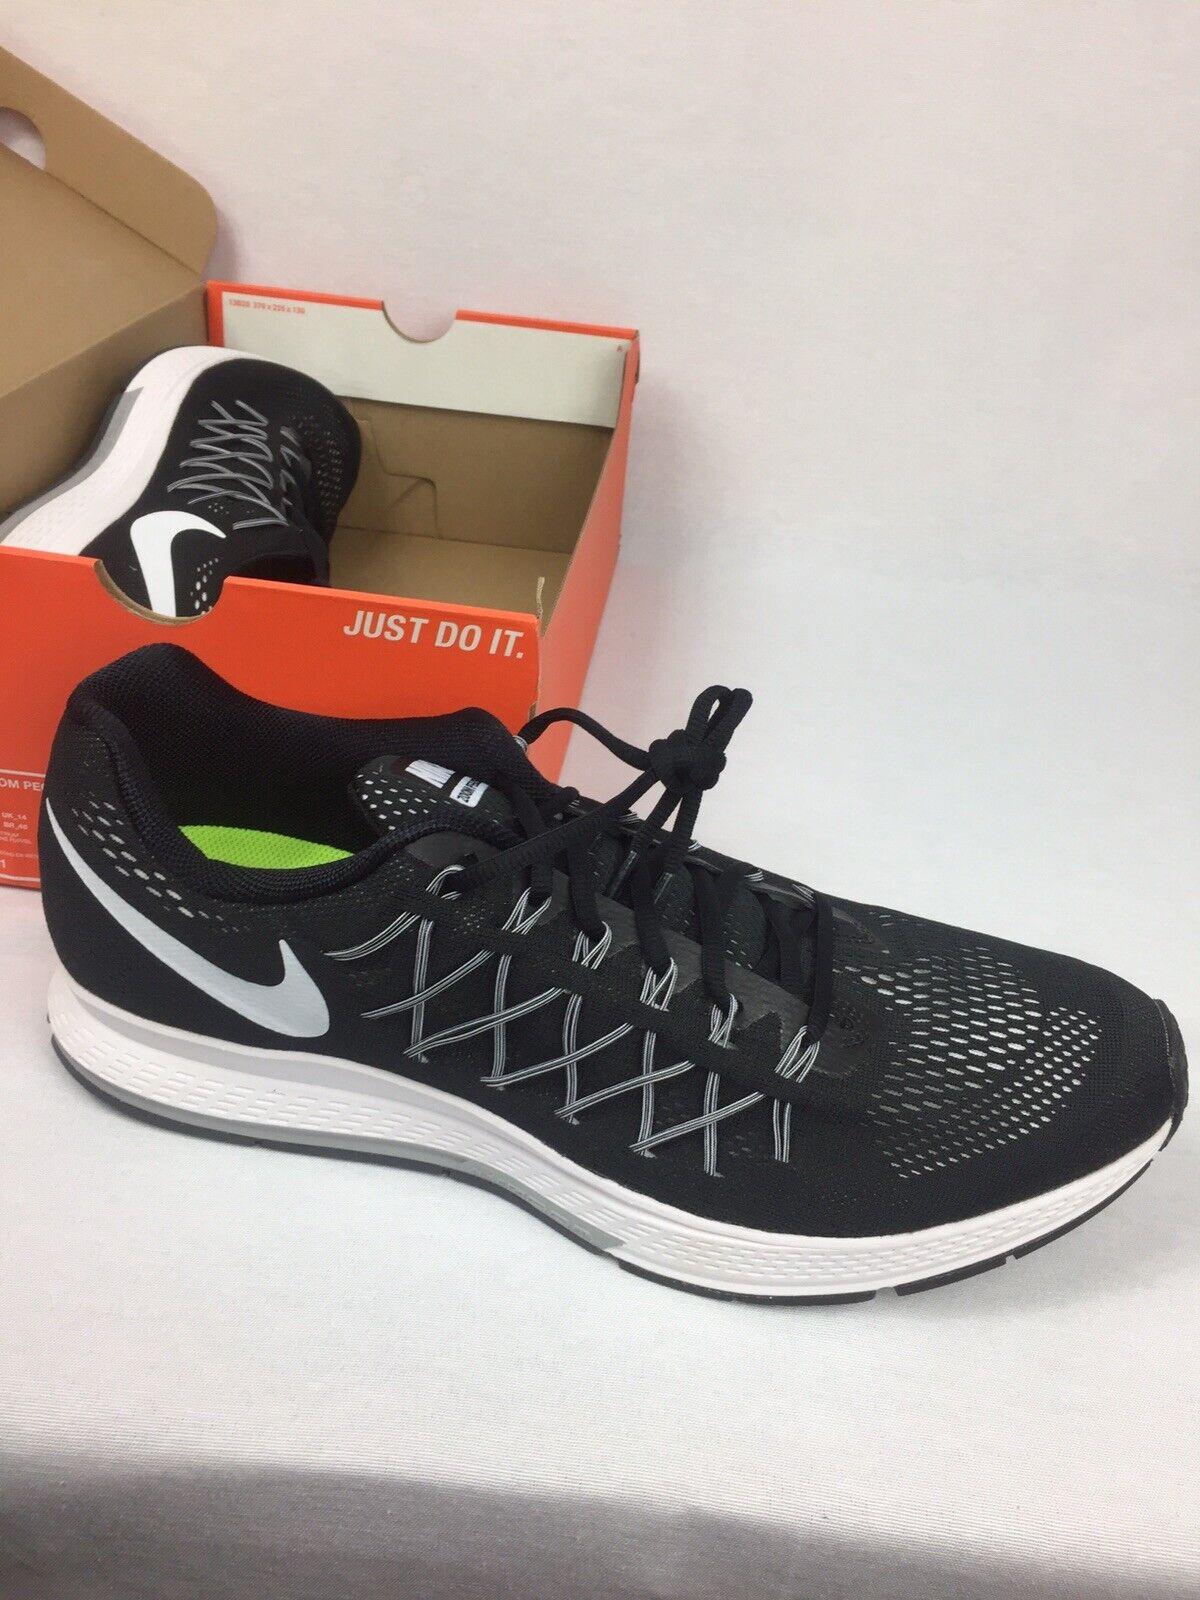 Nike air zoom pegasus 32 Black white Mens shoes Size 9 NWB Has A Name On shoes